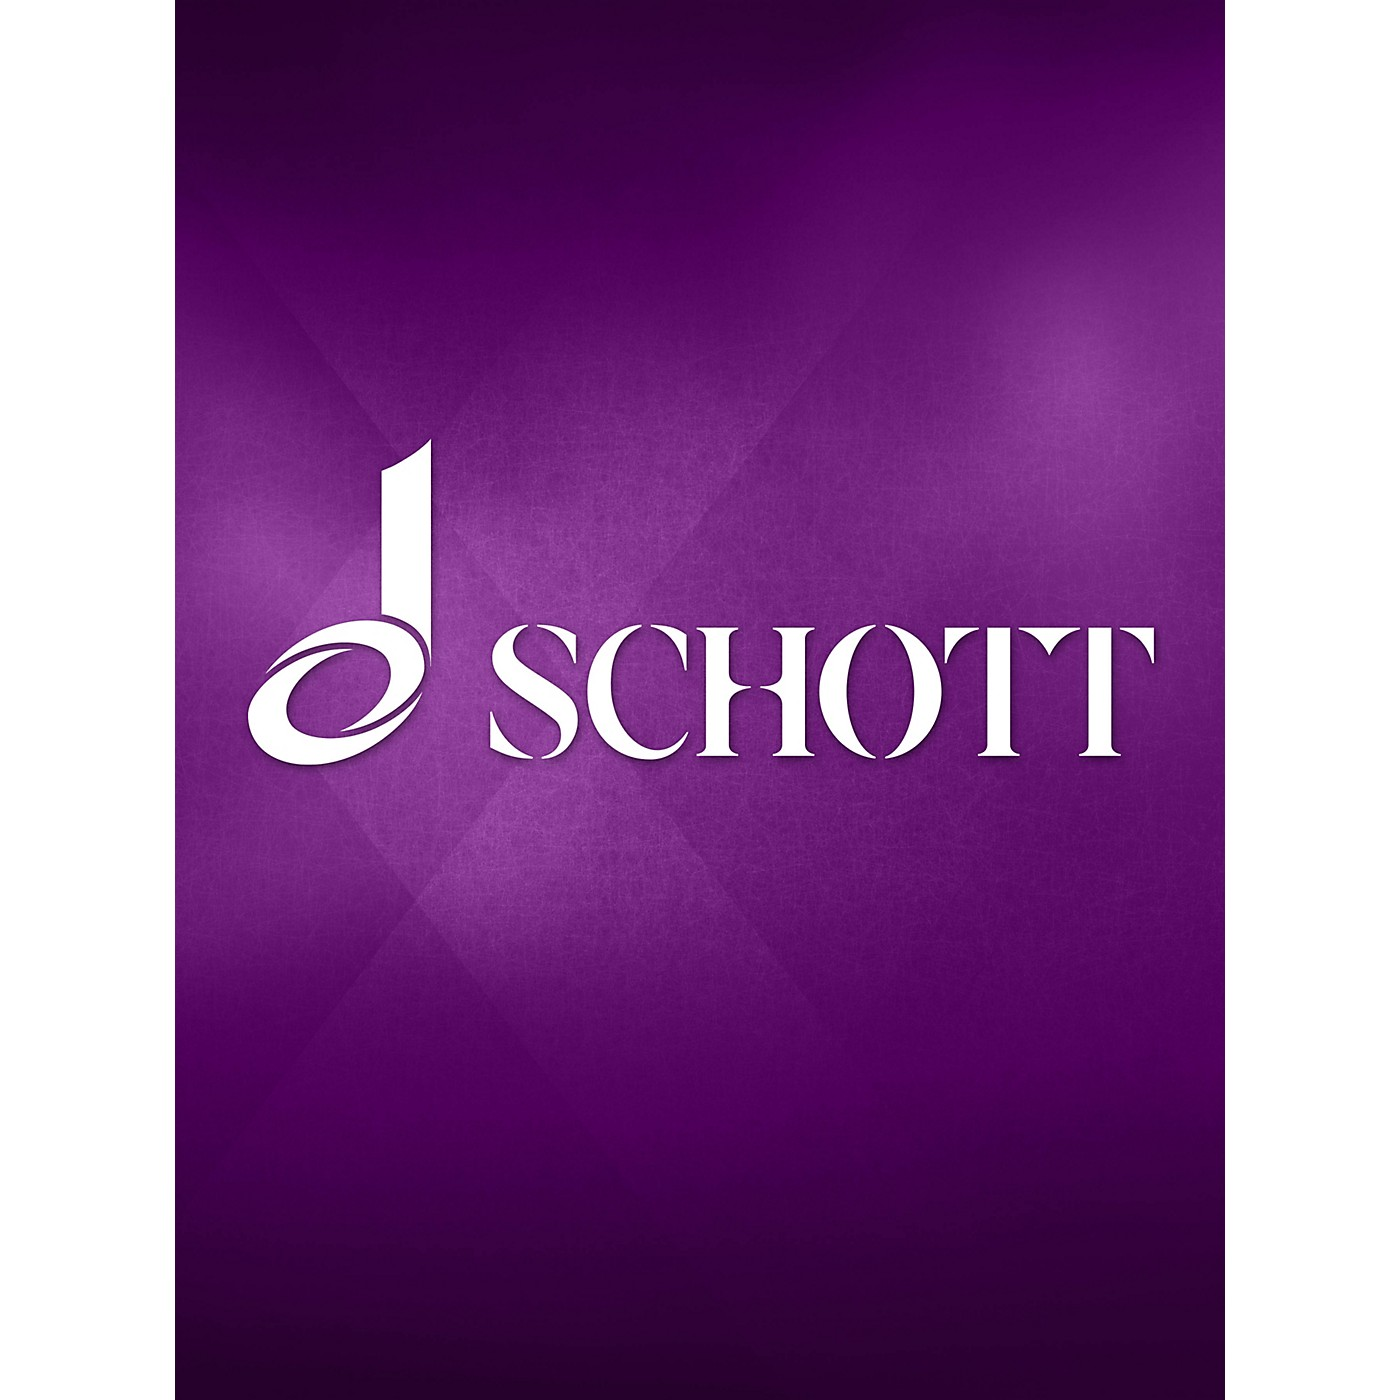 Schott Concerto à 7 (Treble Recorder 1 Part) Schott Series by Georg Philipp Telemann thumbnail